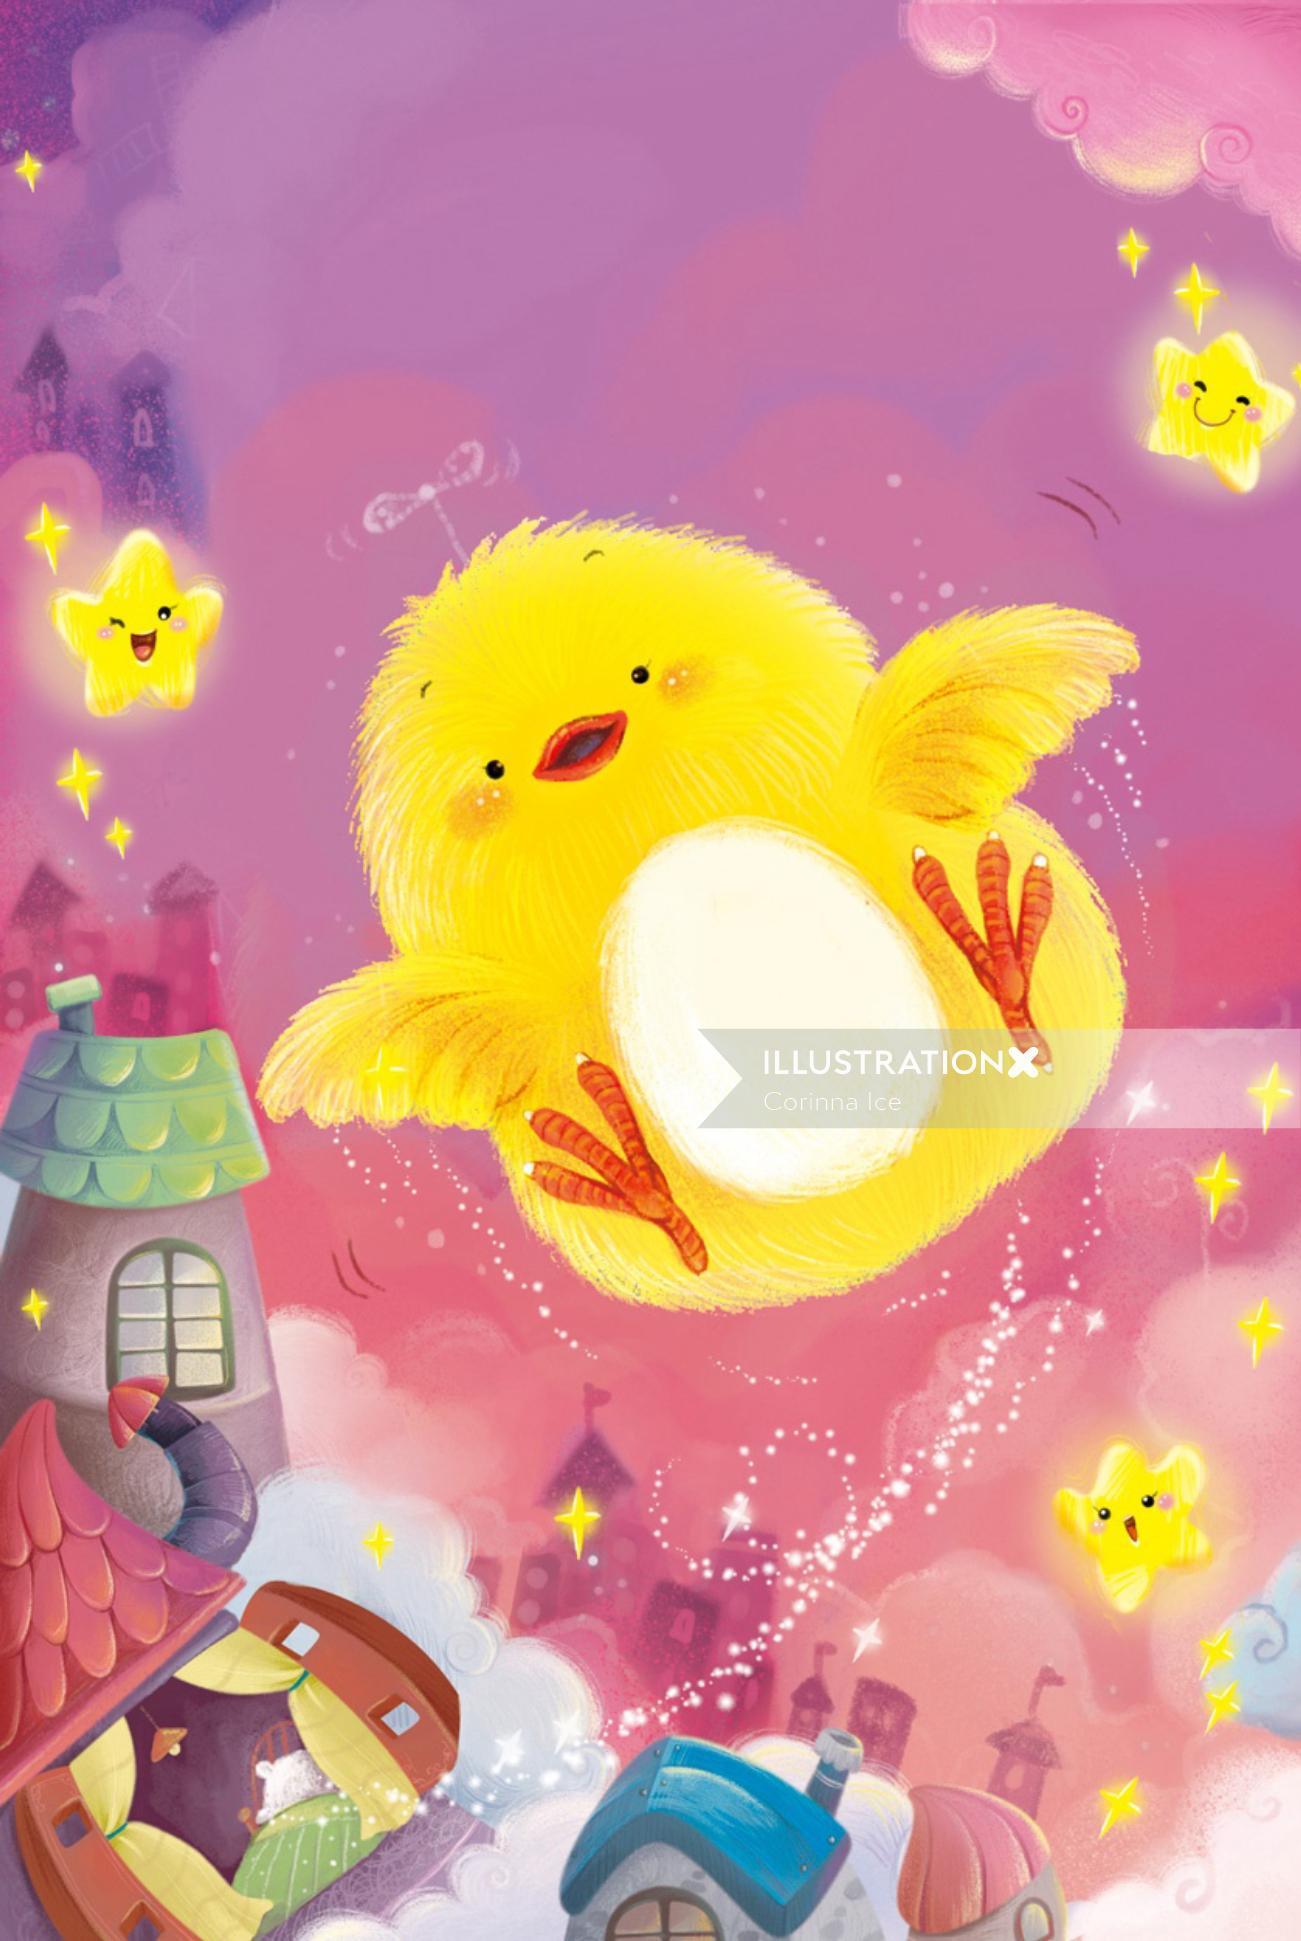 Bird dreaming watercolor painting